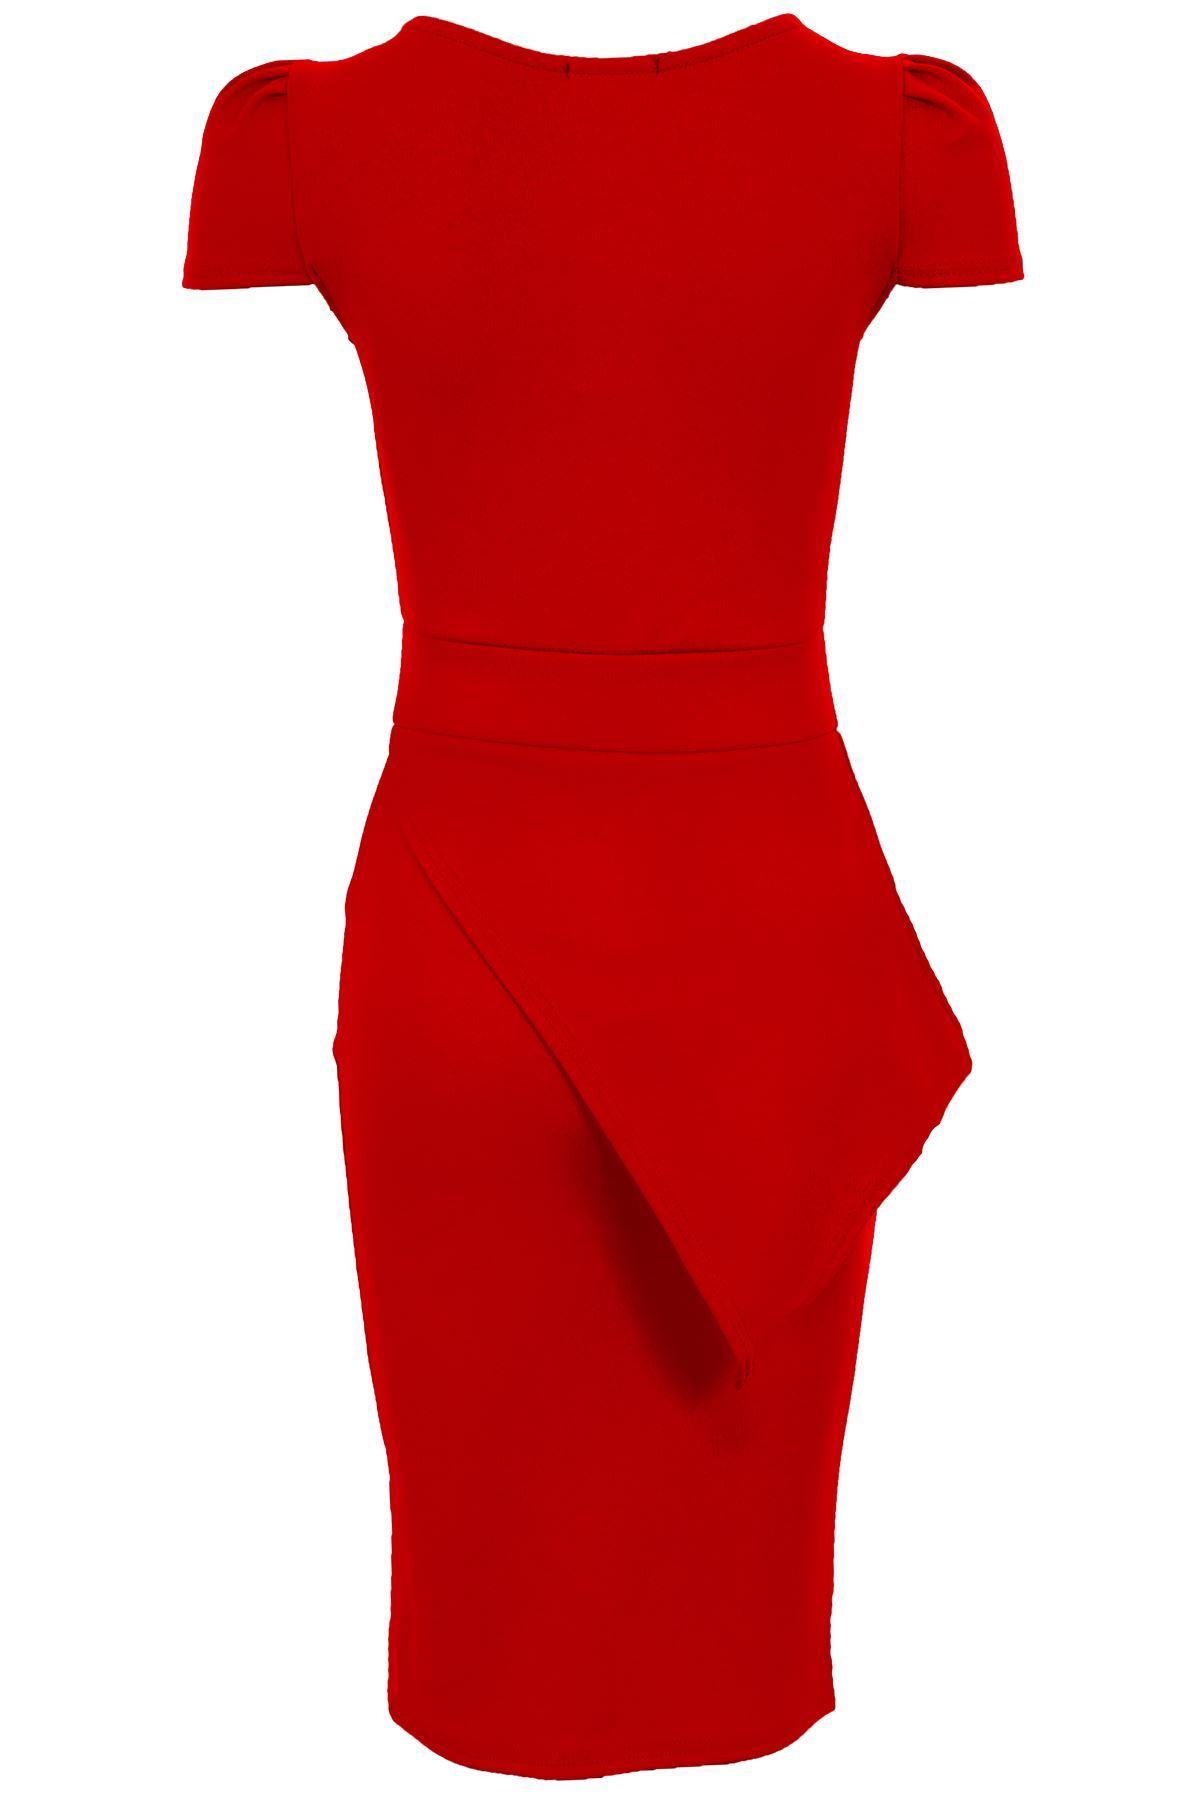 Ladies Cap Sleeve Asymmetric Neon Pencil Bodycon Sexy Women's Midi Party Dress